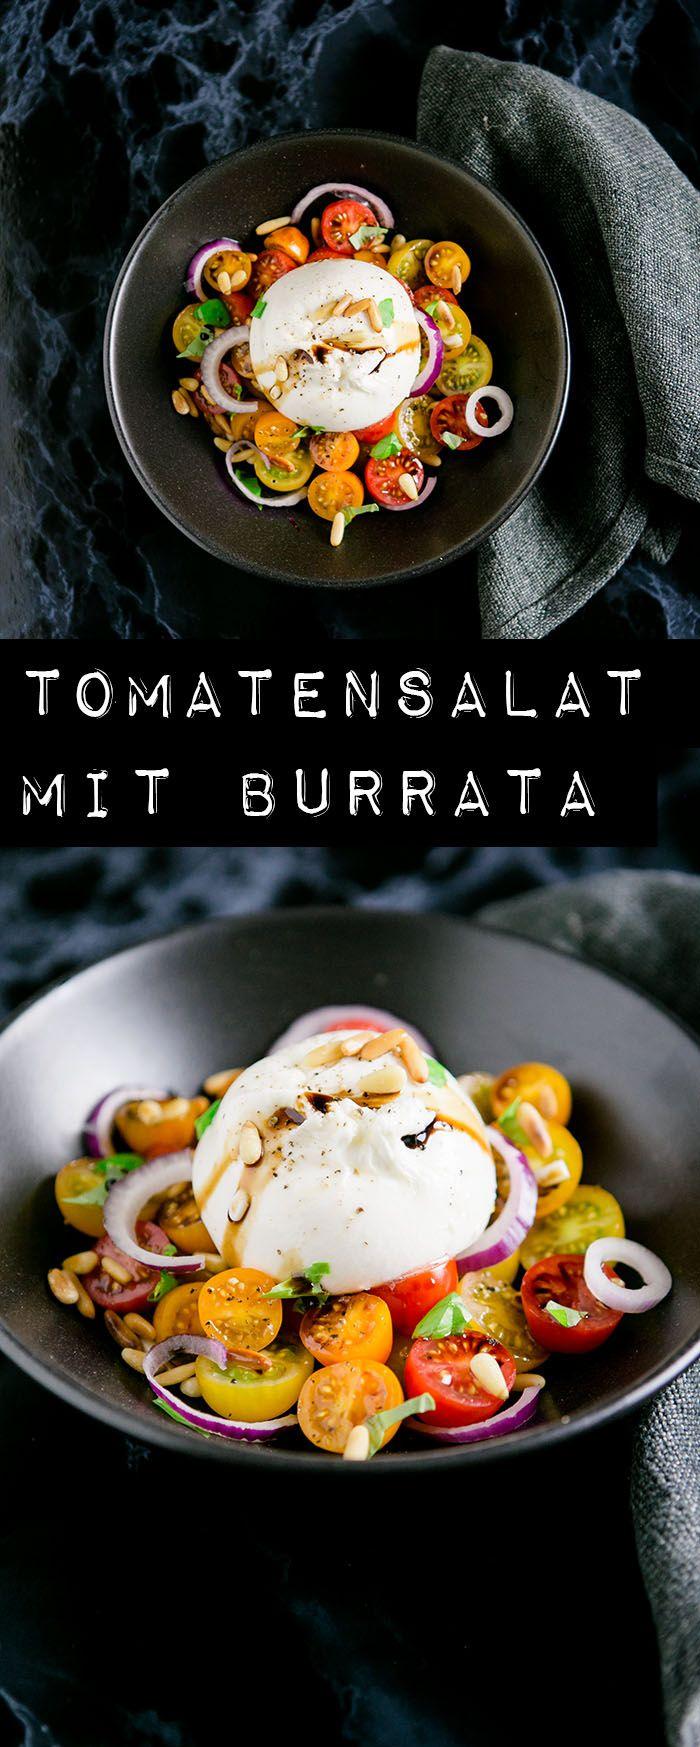 Photo of Tomatensalat mit Burrata – DAS Sommeressen – Kuechenchaotin